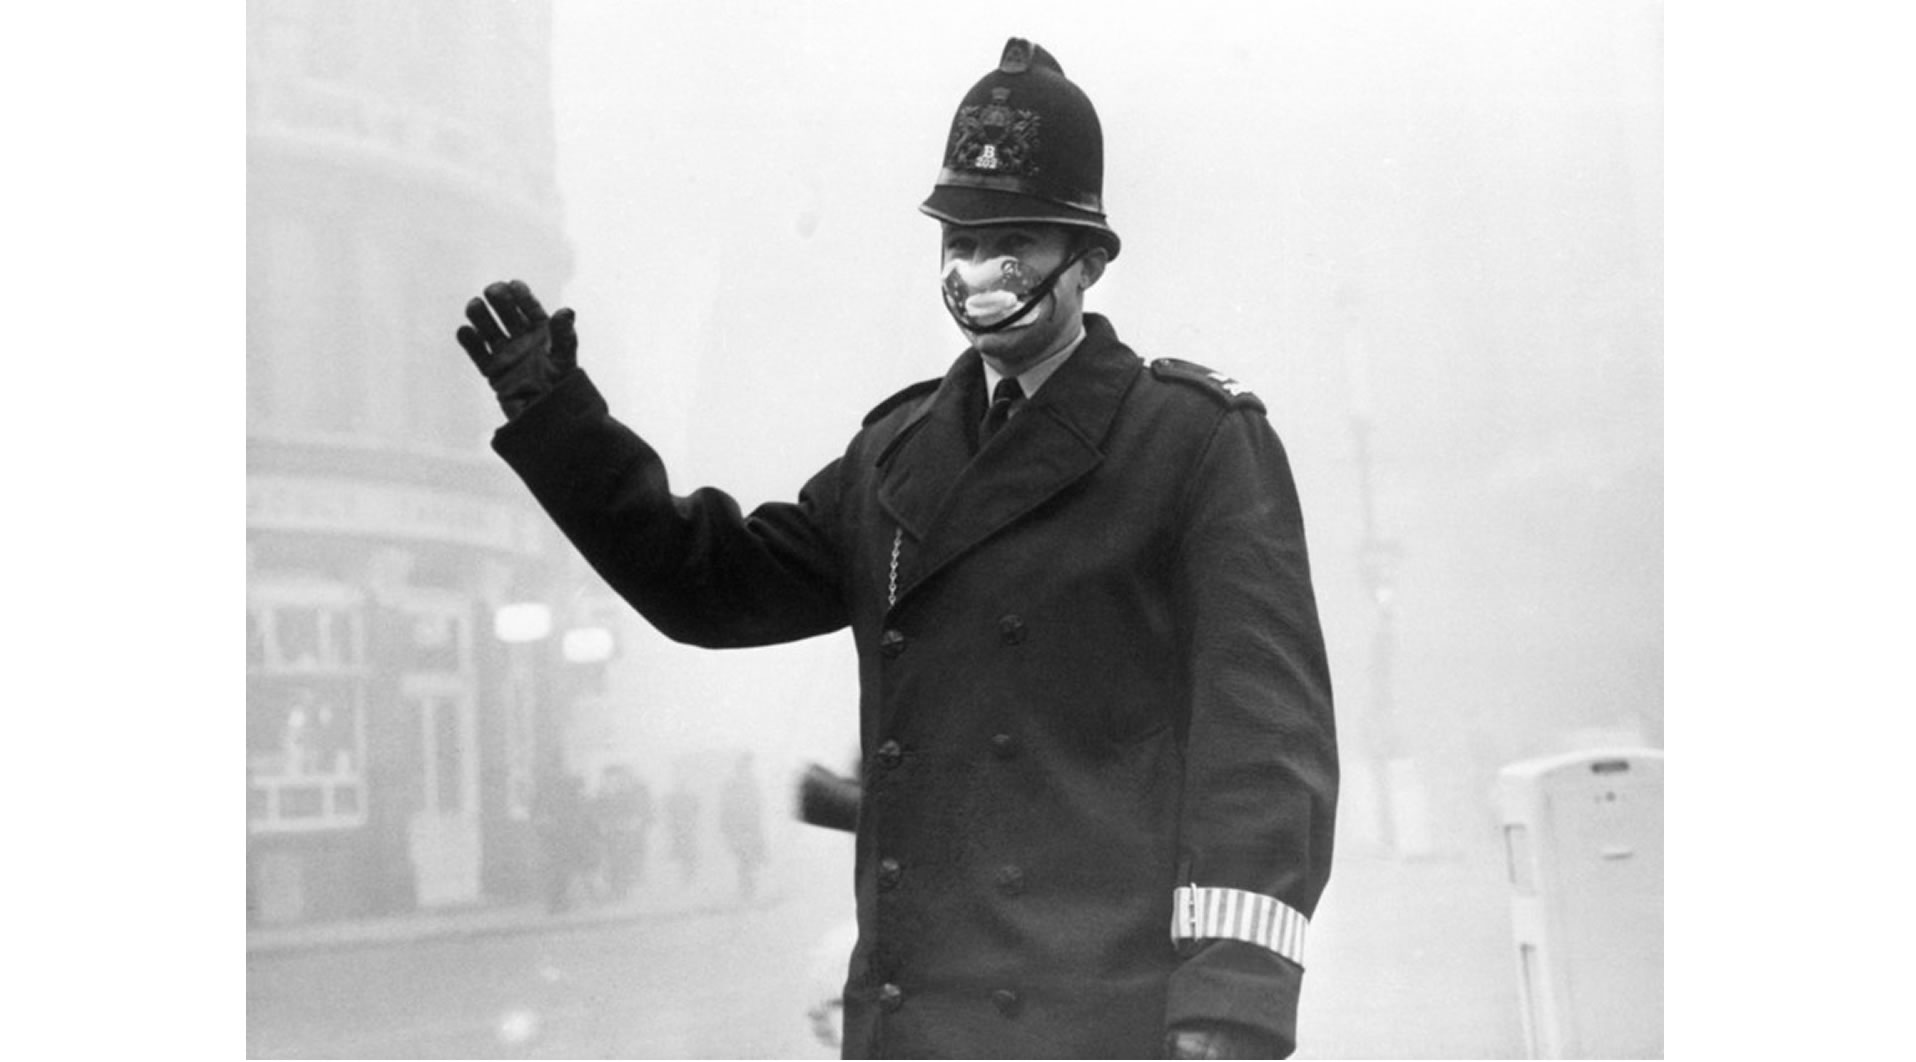 Bobby versinkt im Nebel von London